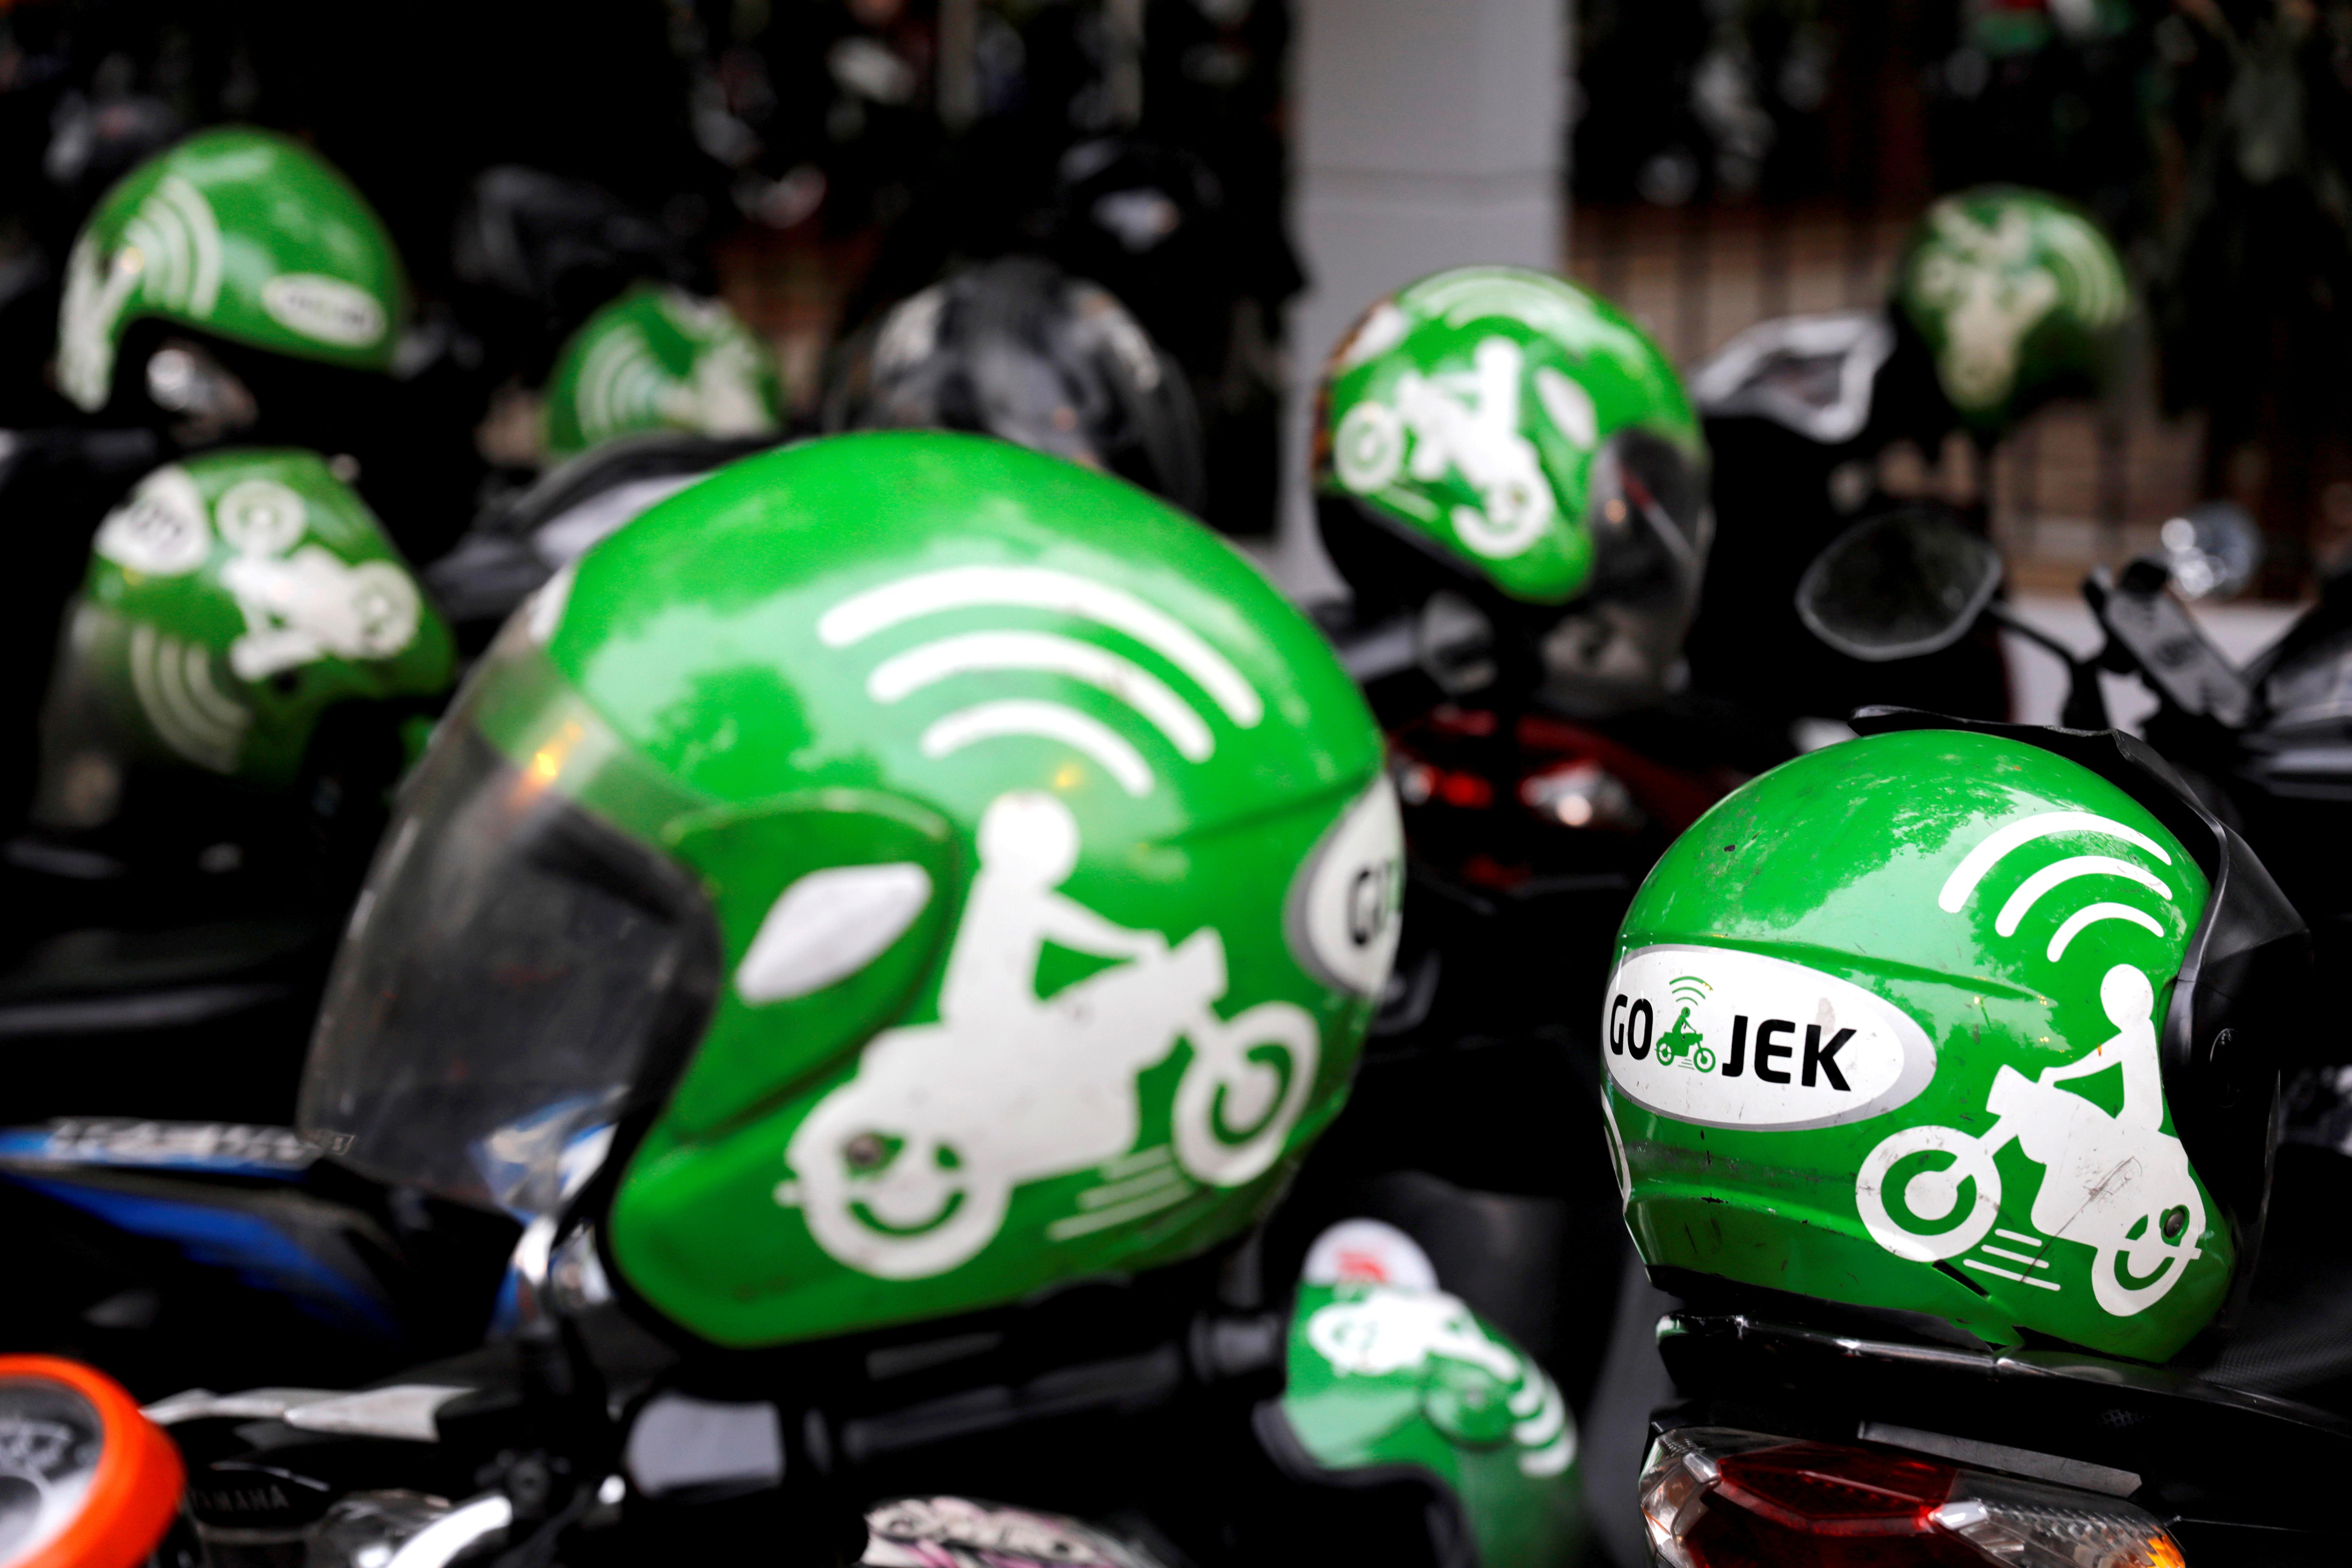 Gojek driver helmets are seen during Go-Food festival in Jakarta, Indonesia, October 27, 2018. REUTERS/Beawiharta